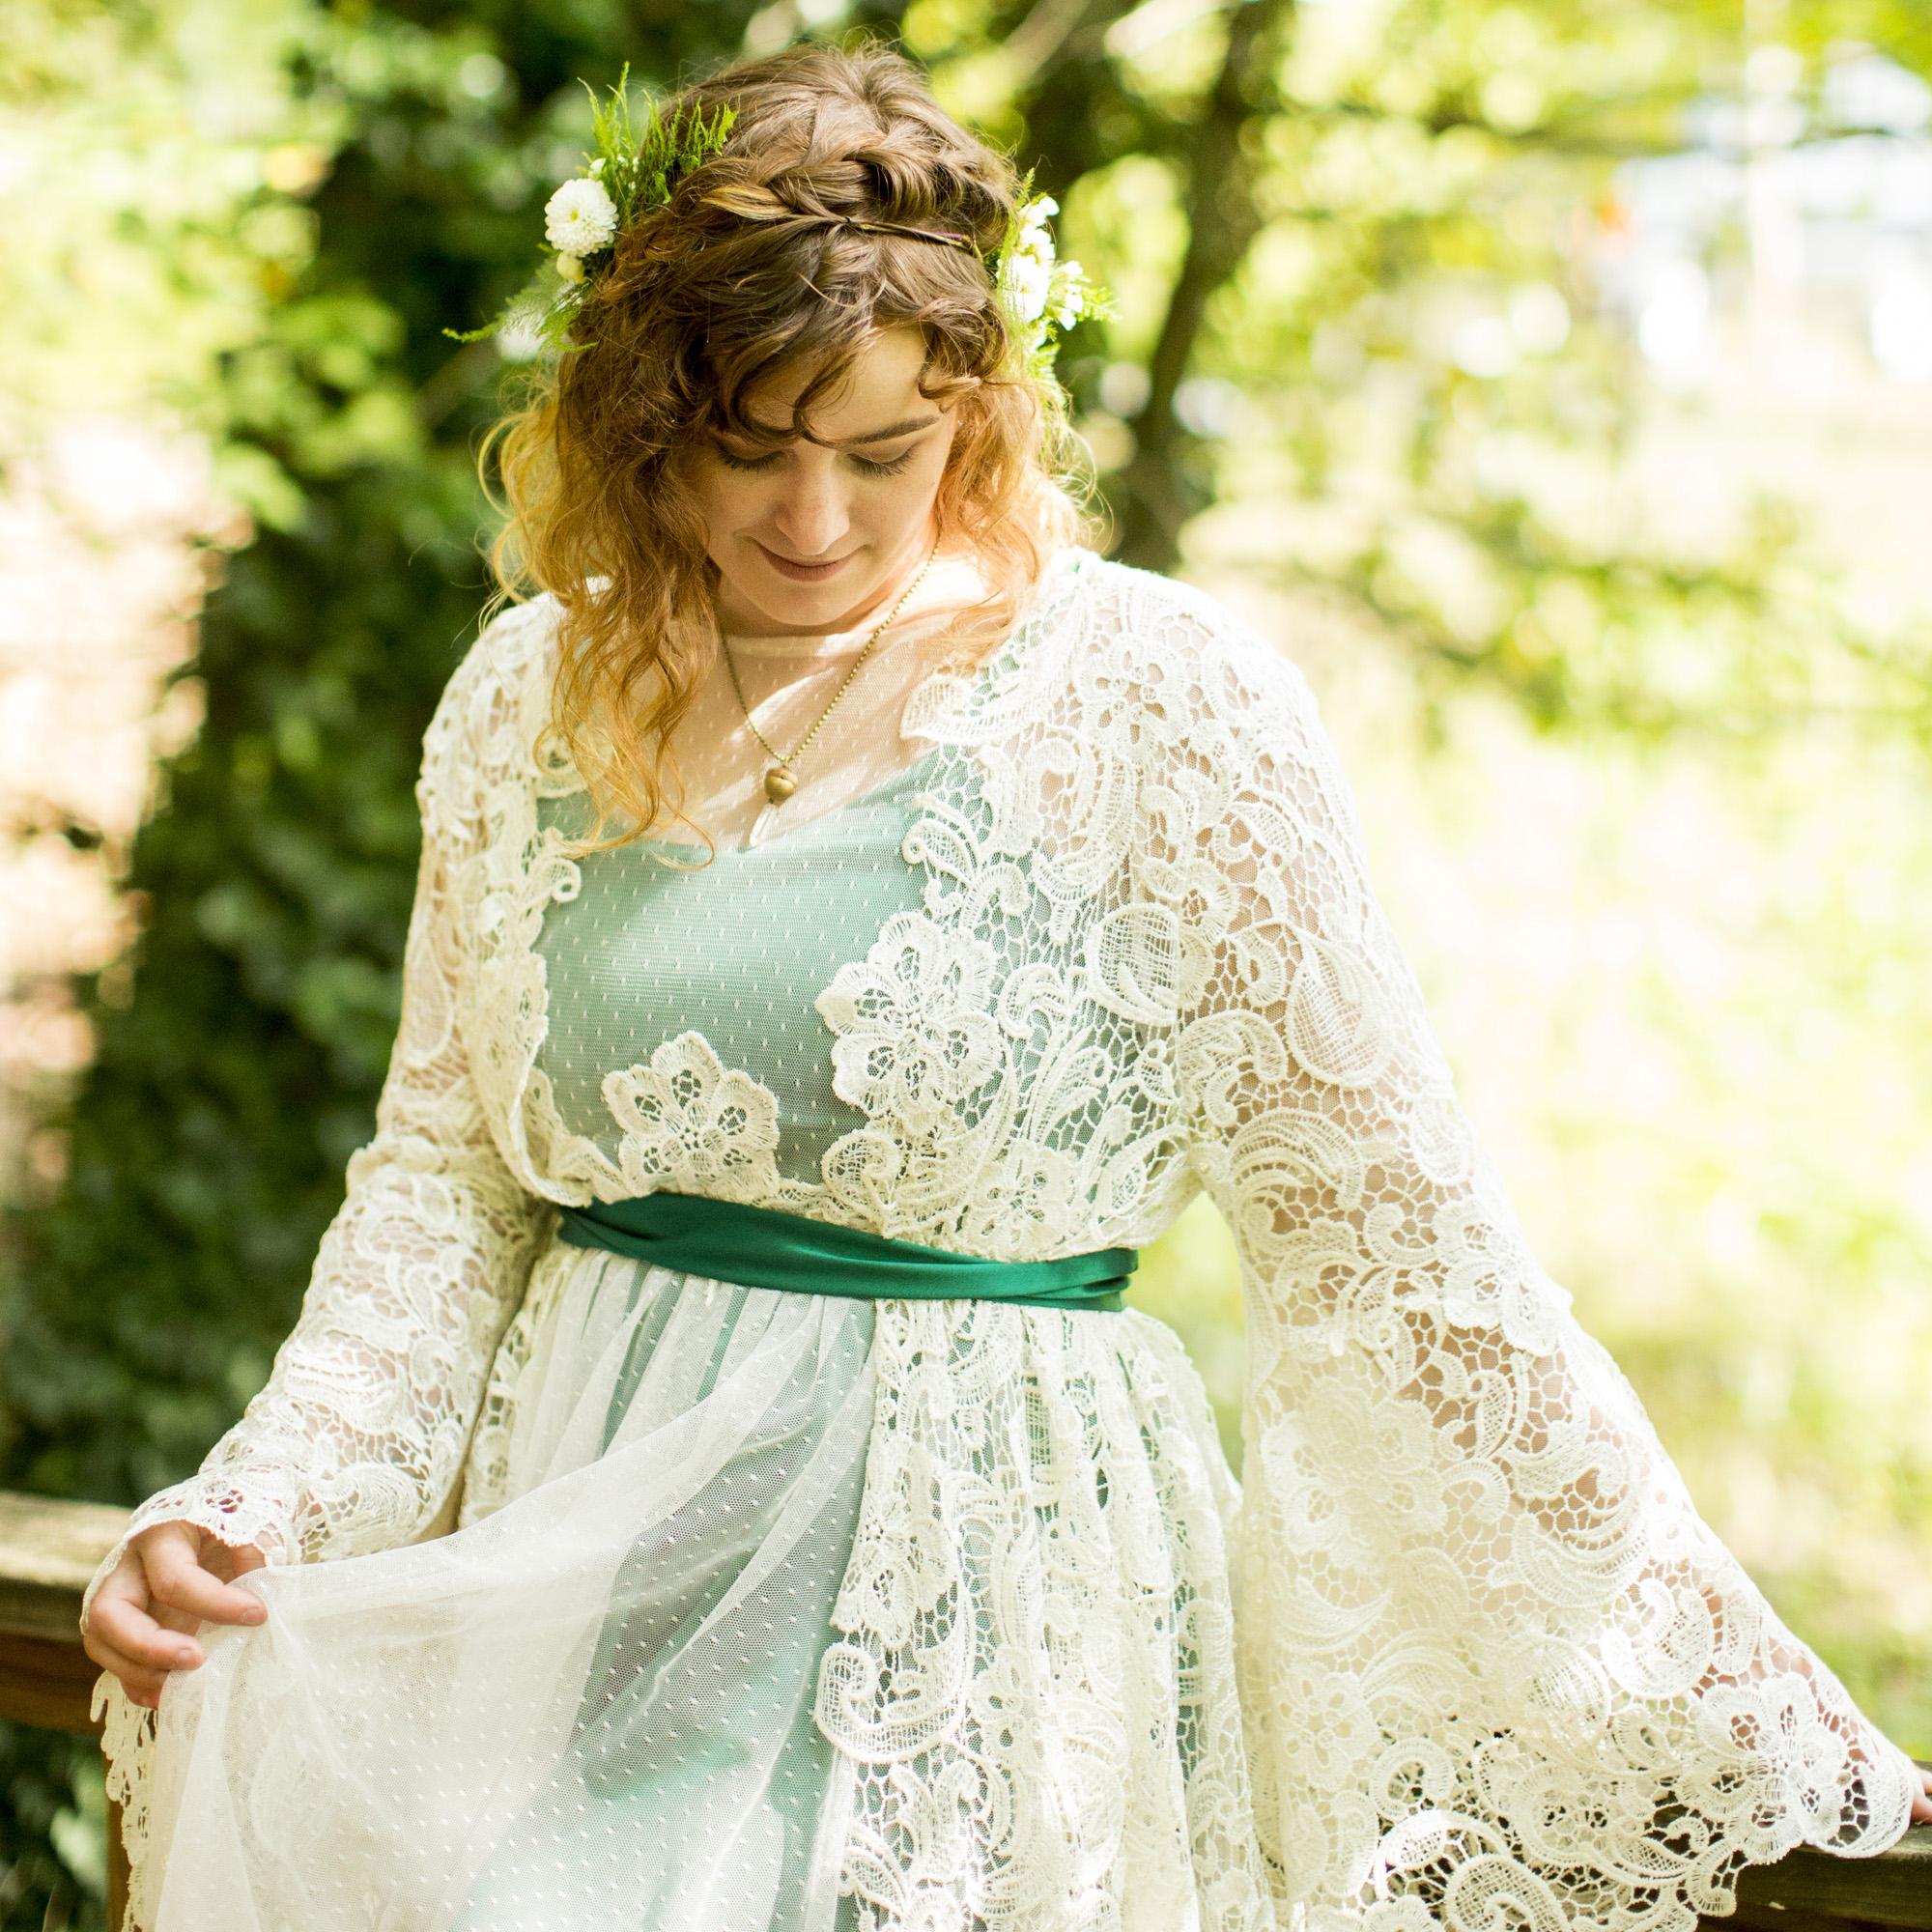 Seriously_Sabrina_Photography_Red_River_Gorge_Kentucky_Wedding_ShawnDana69.jpg